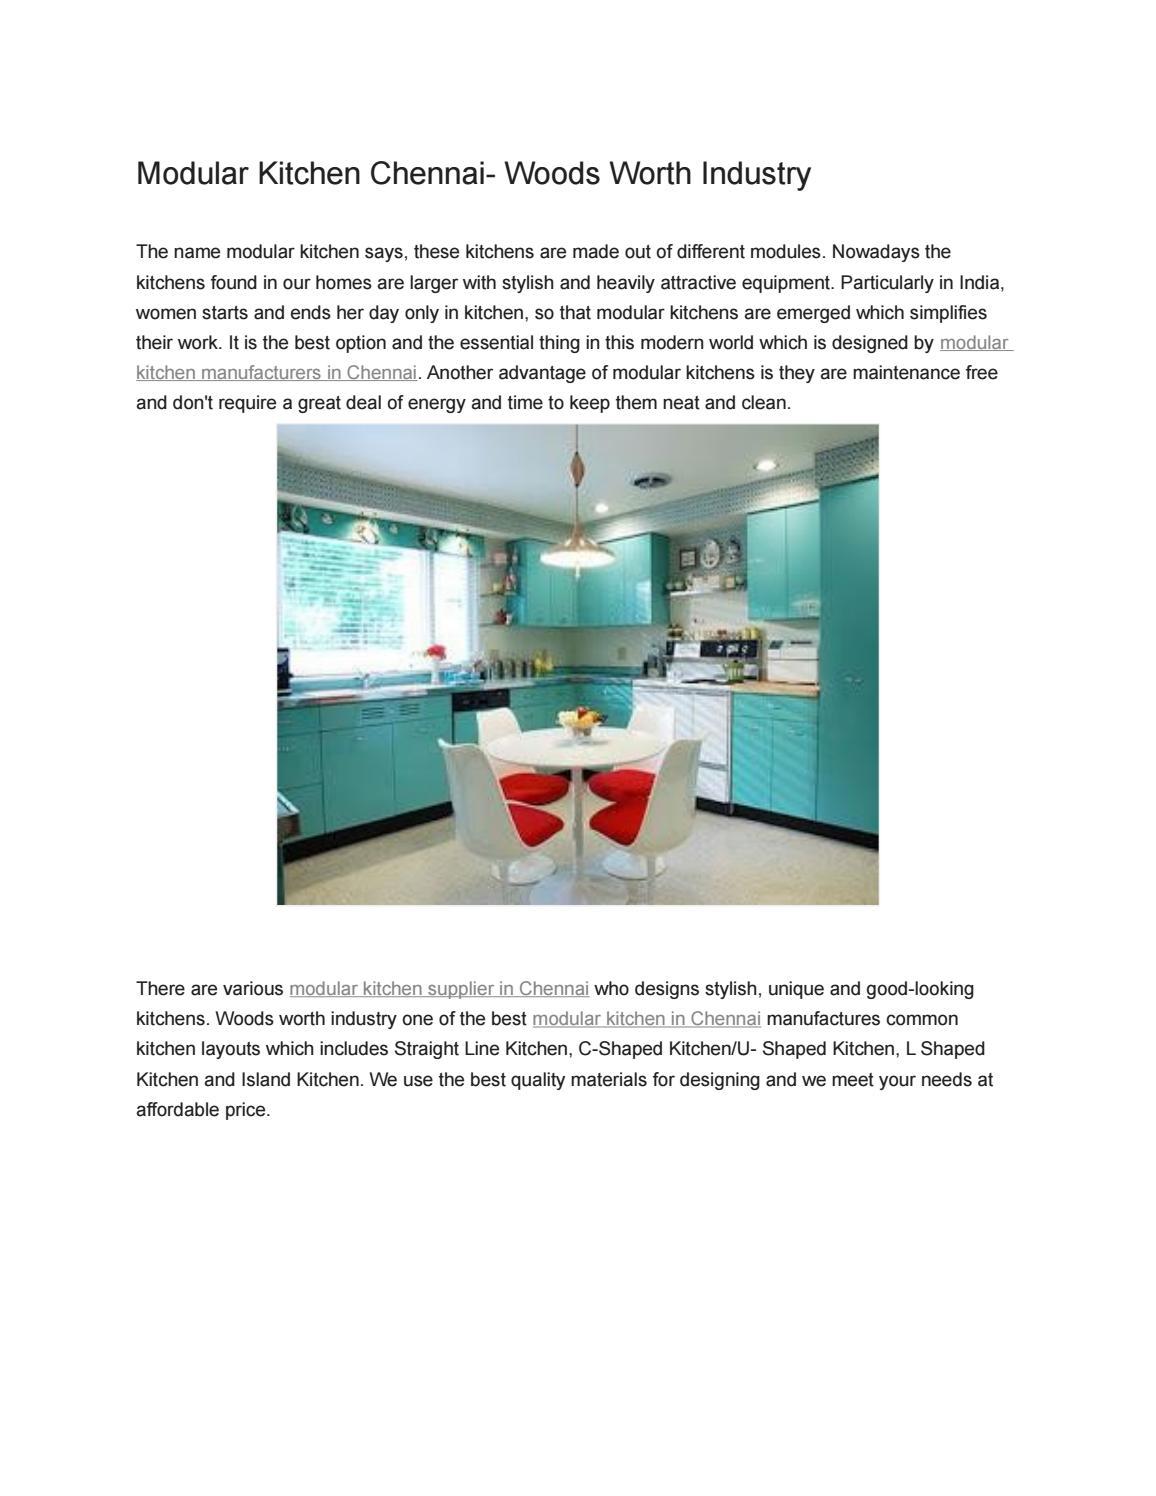 Modular kitchen chennai woods worth industry by woodsworth89 - issuu